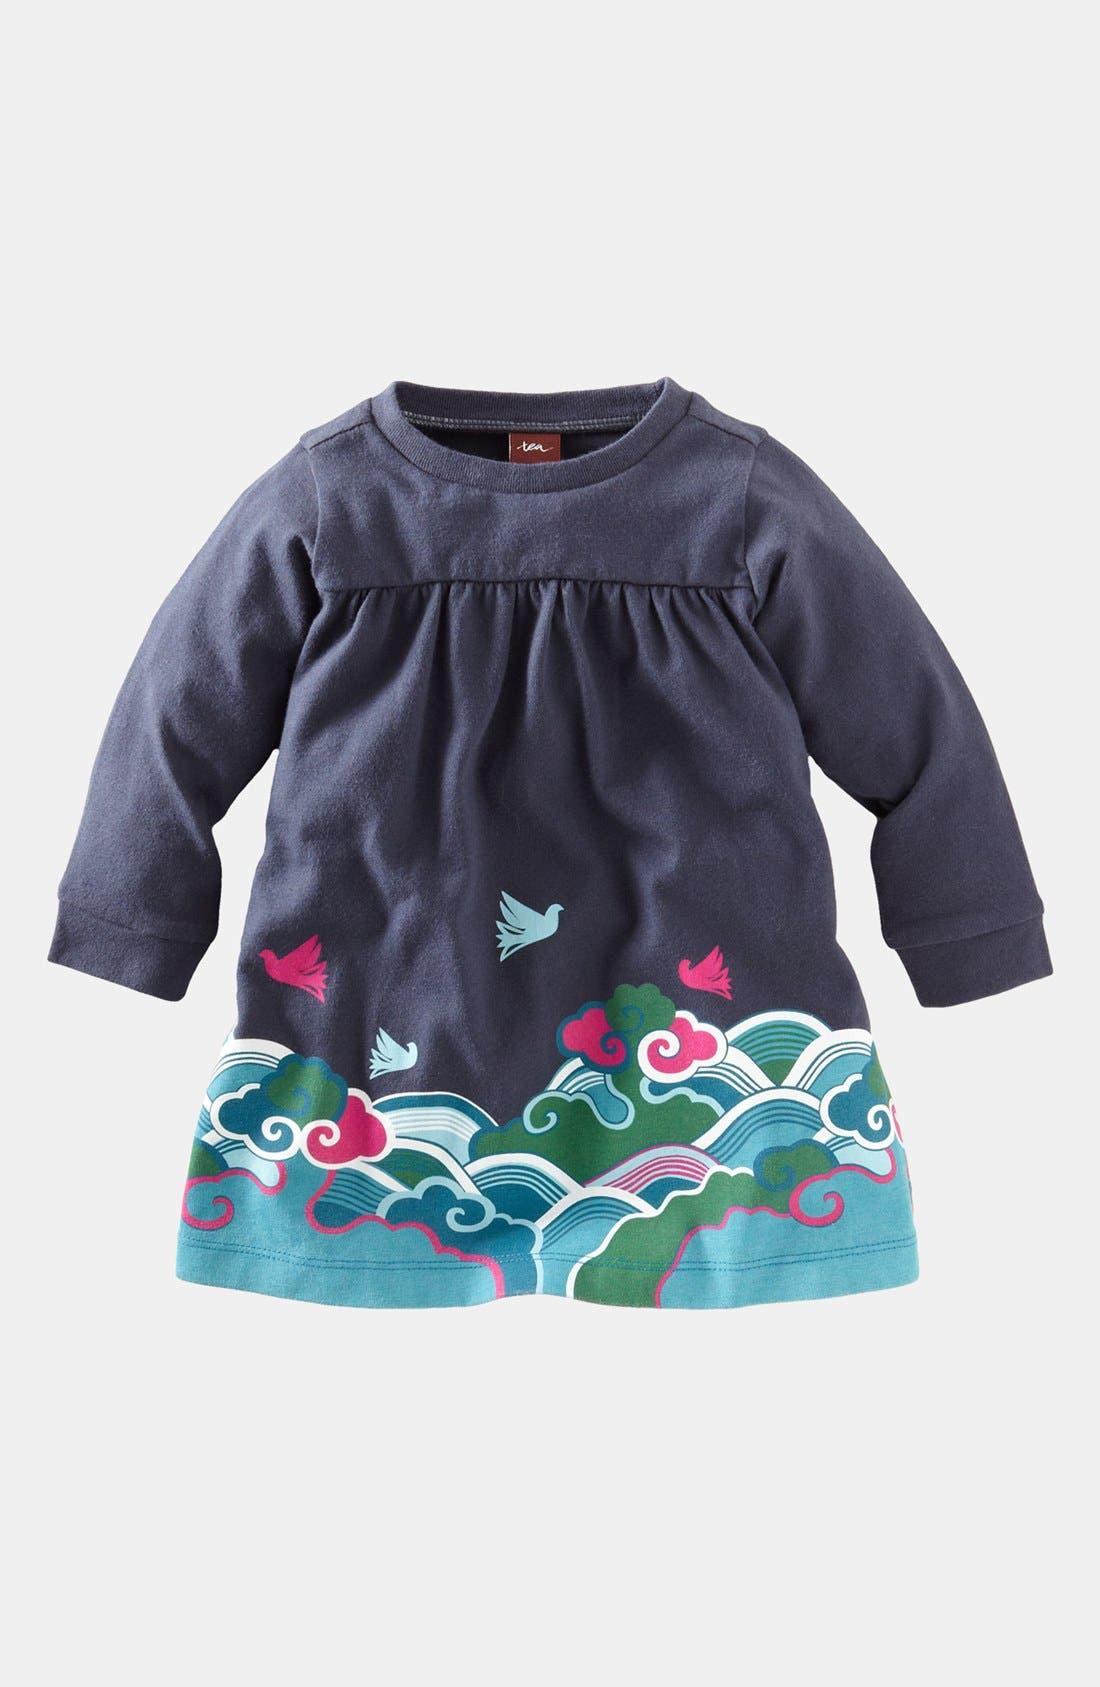 Alternate Image 1 Selected - Tea Collection 'Fantastic Flight' Dress (Baby Girls)